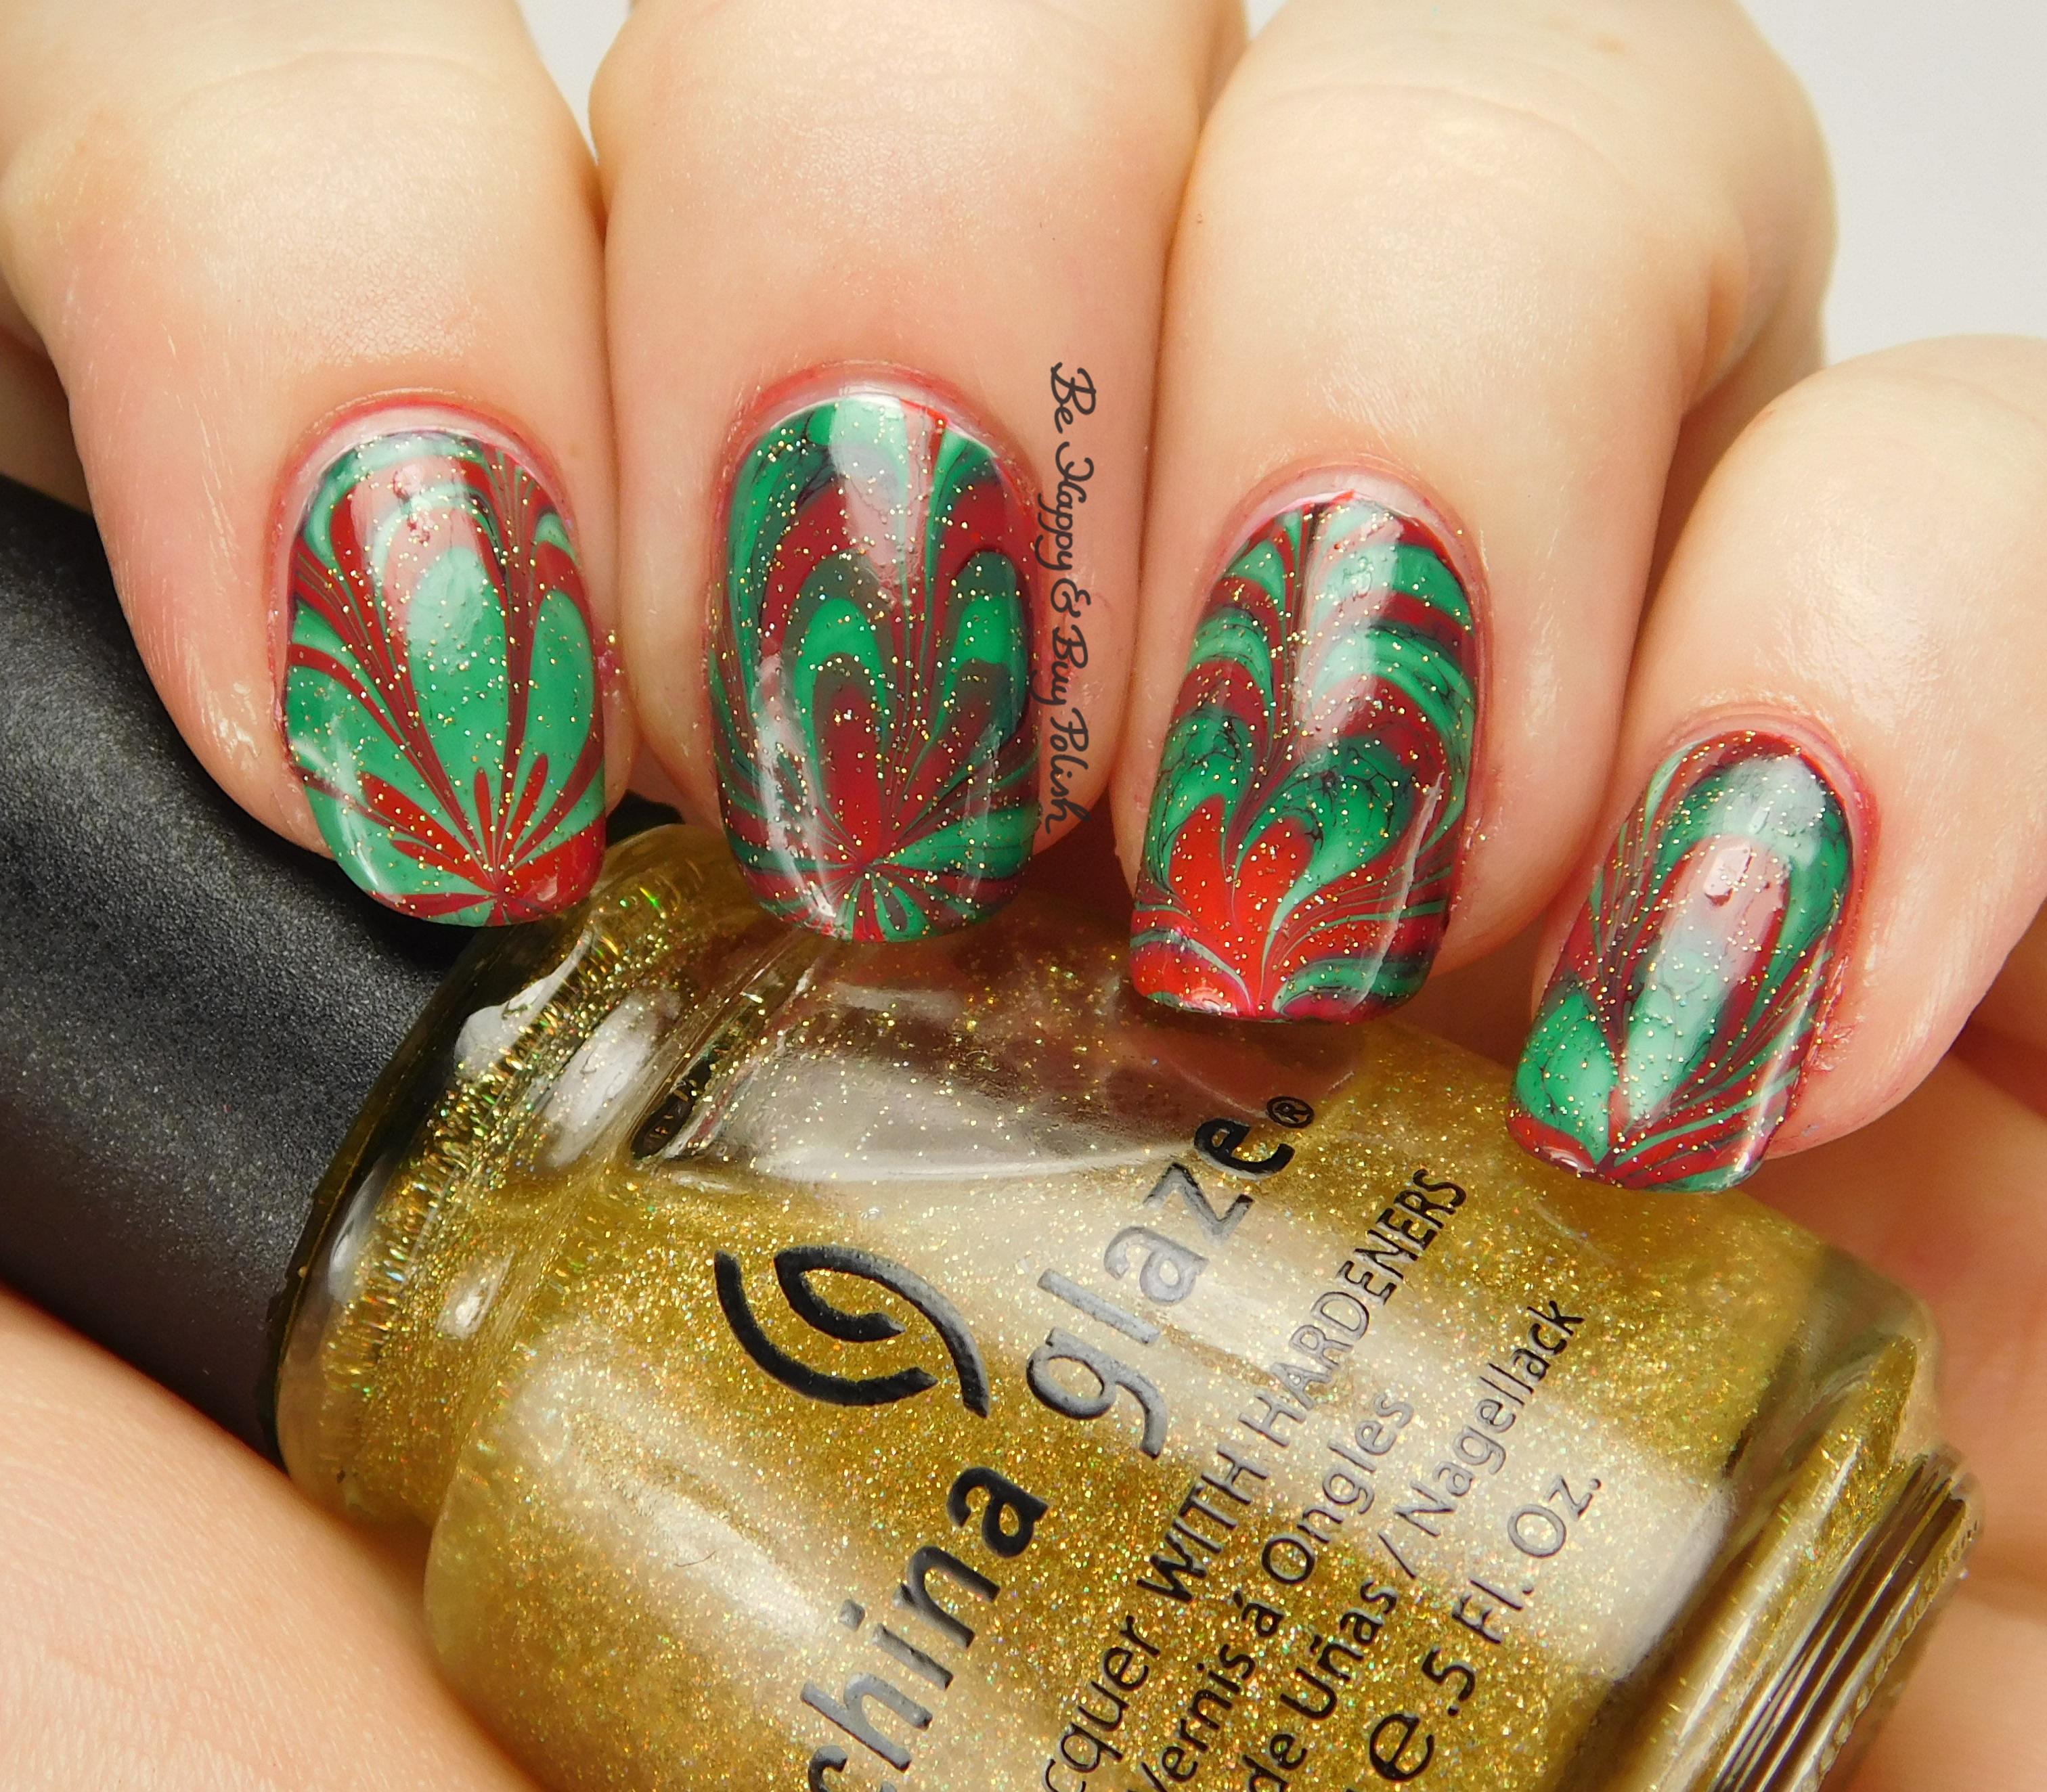 12 Days Of Christmas Nail Art '15